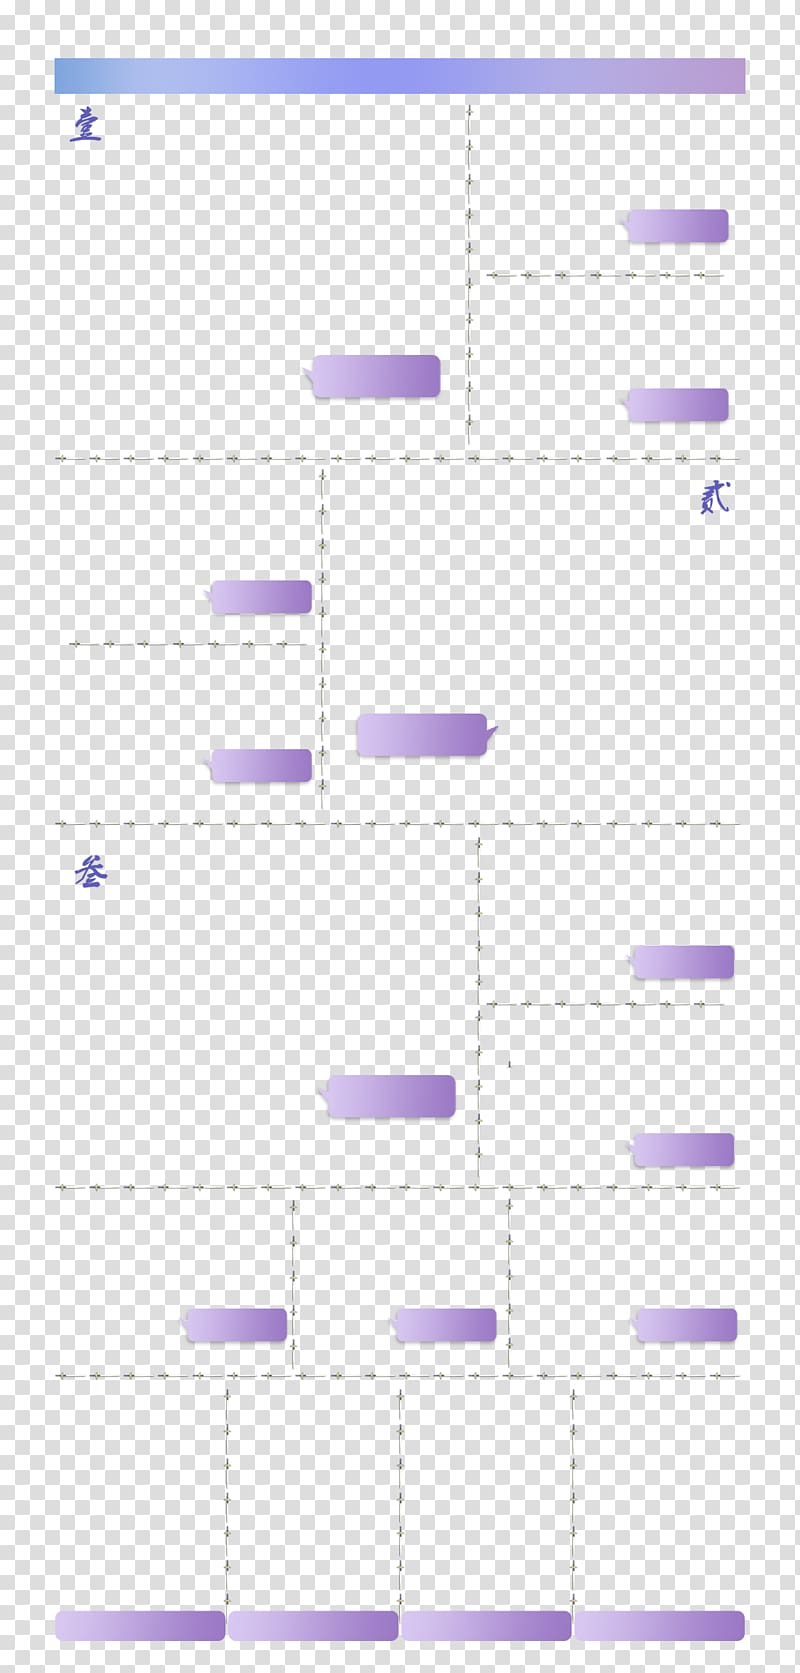 Arranged clipart transparent download Google Icon, Baby activities arranged transparent background PNG ... transparent download